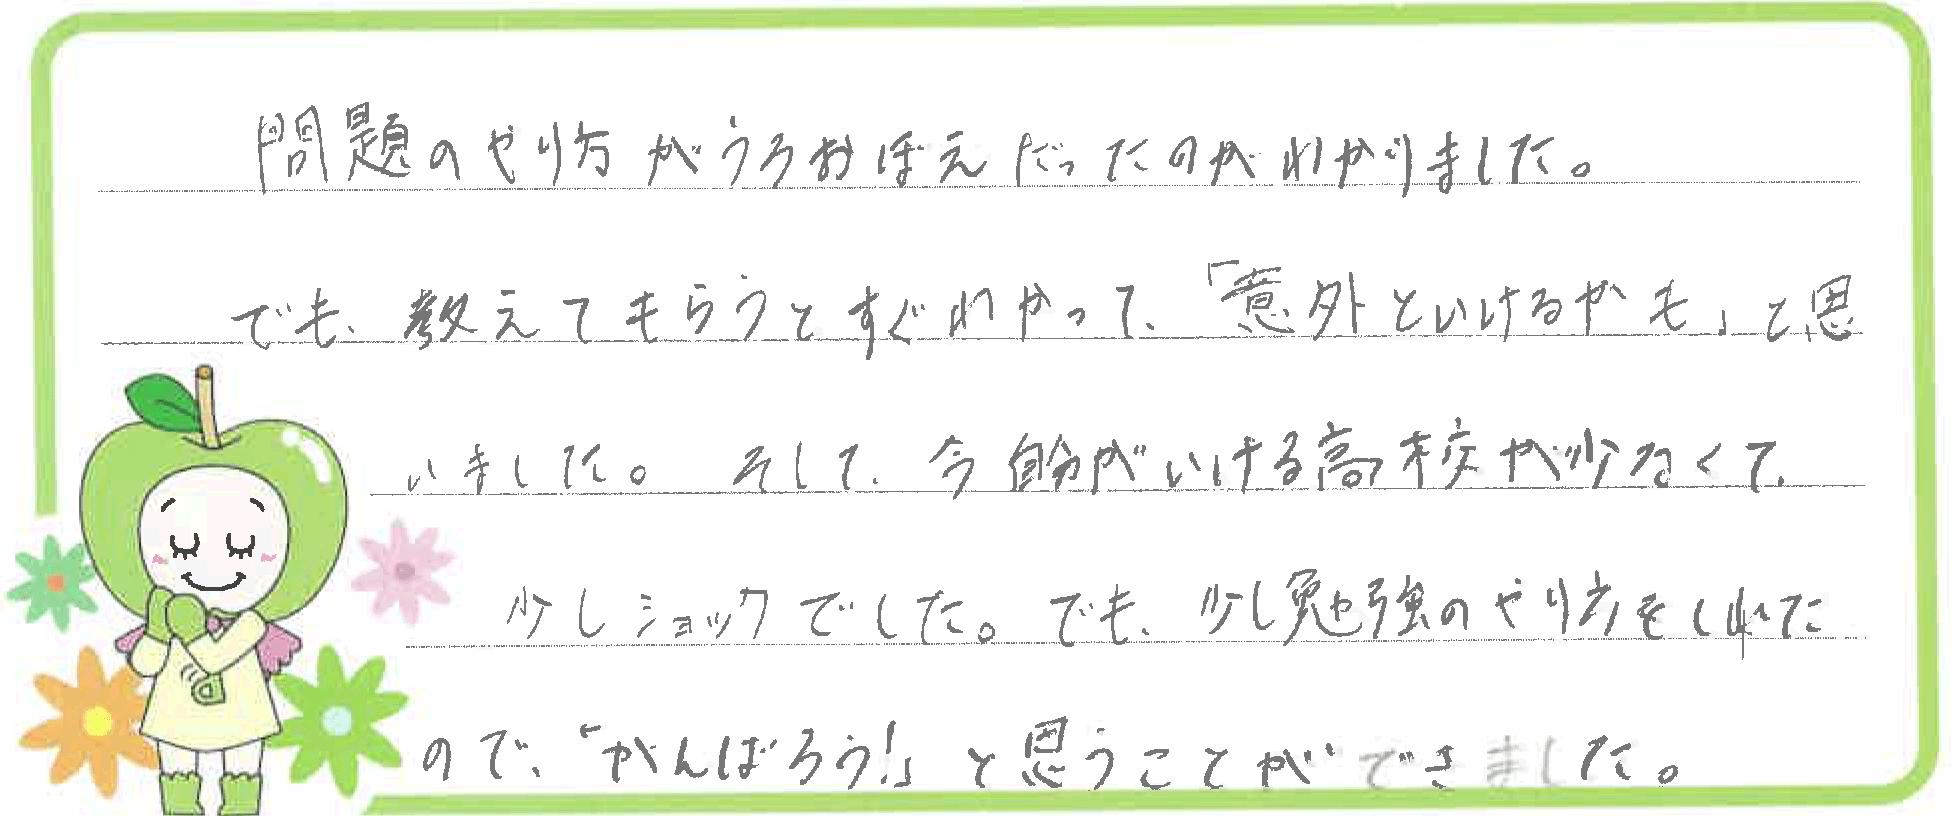 Hちゃん(東海市)からの口コミ